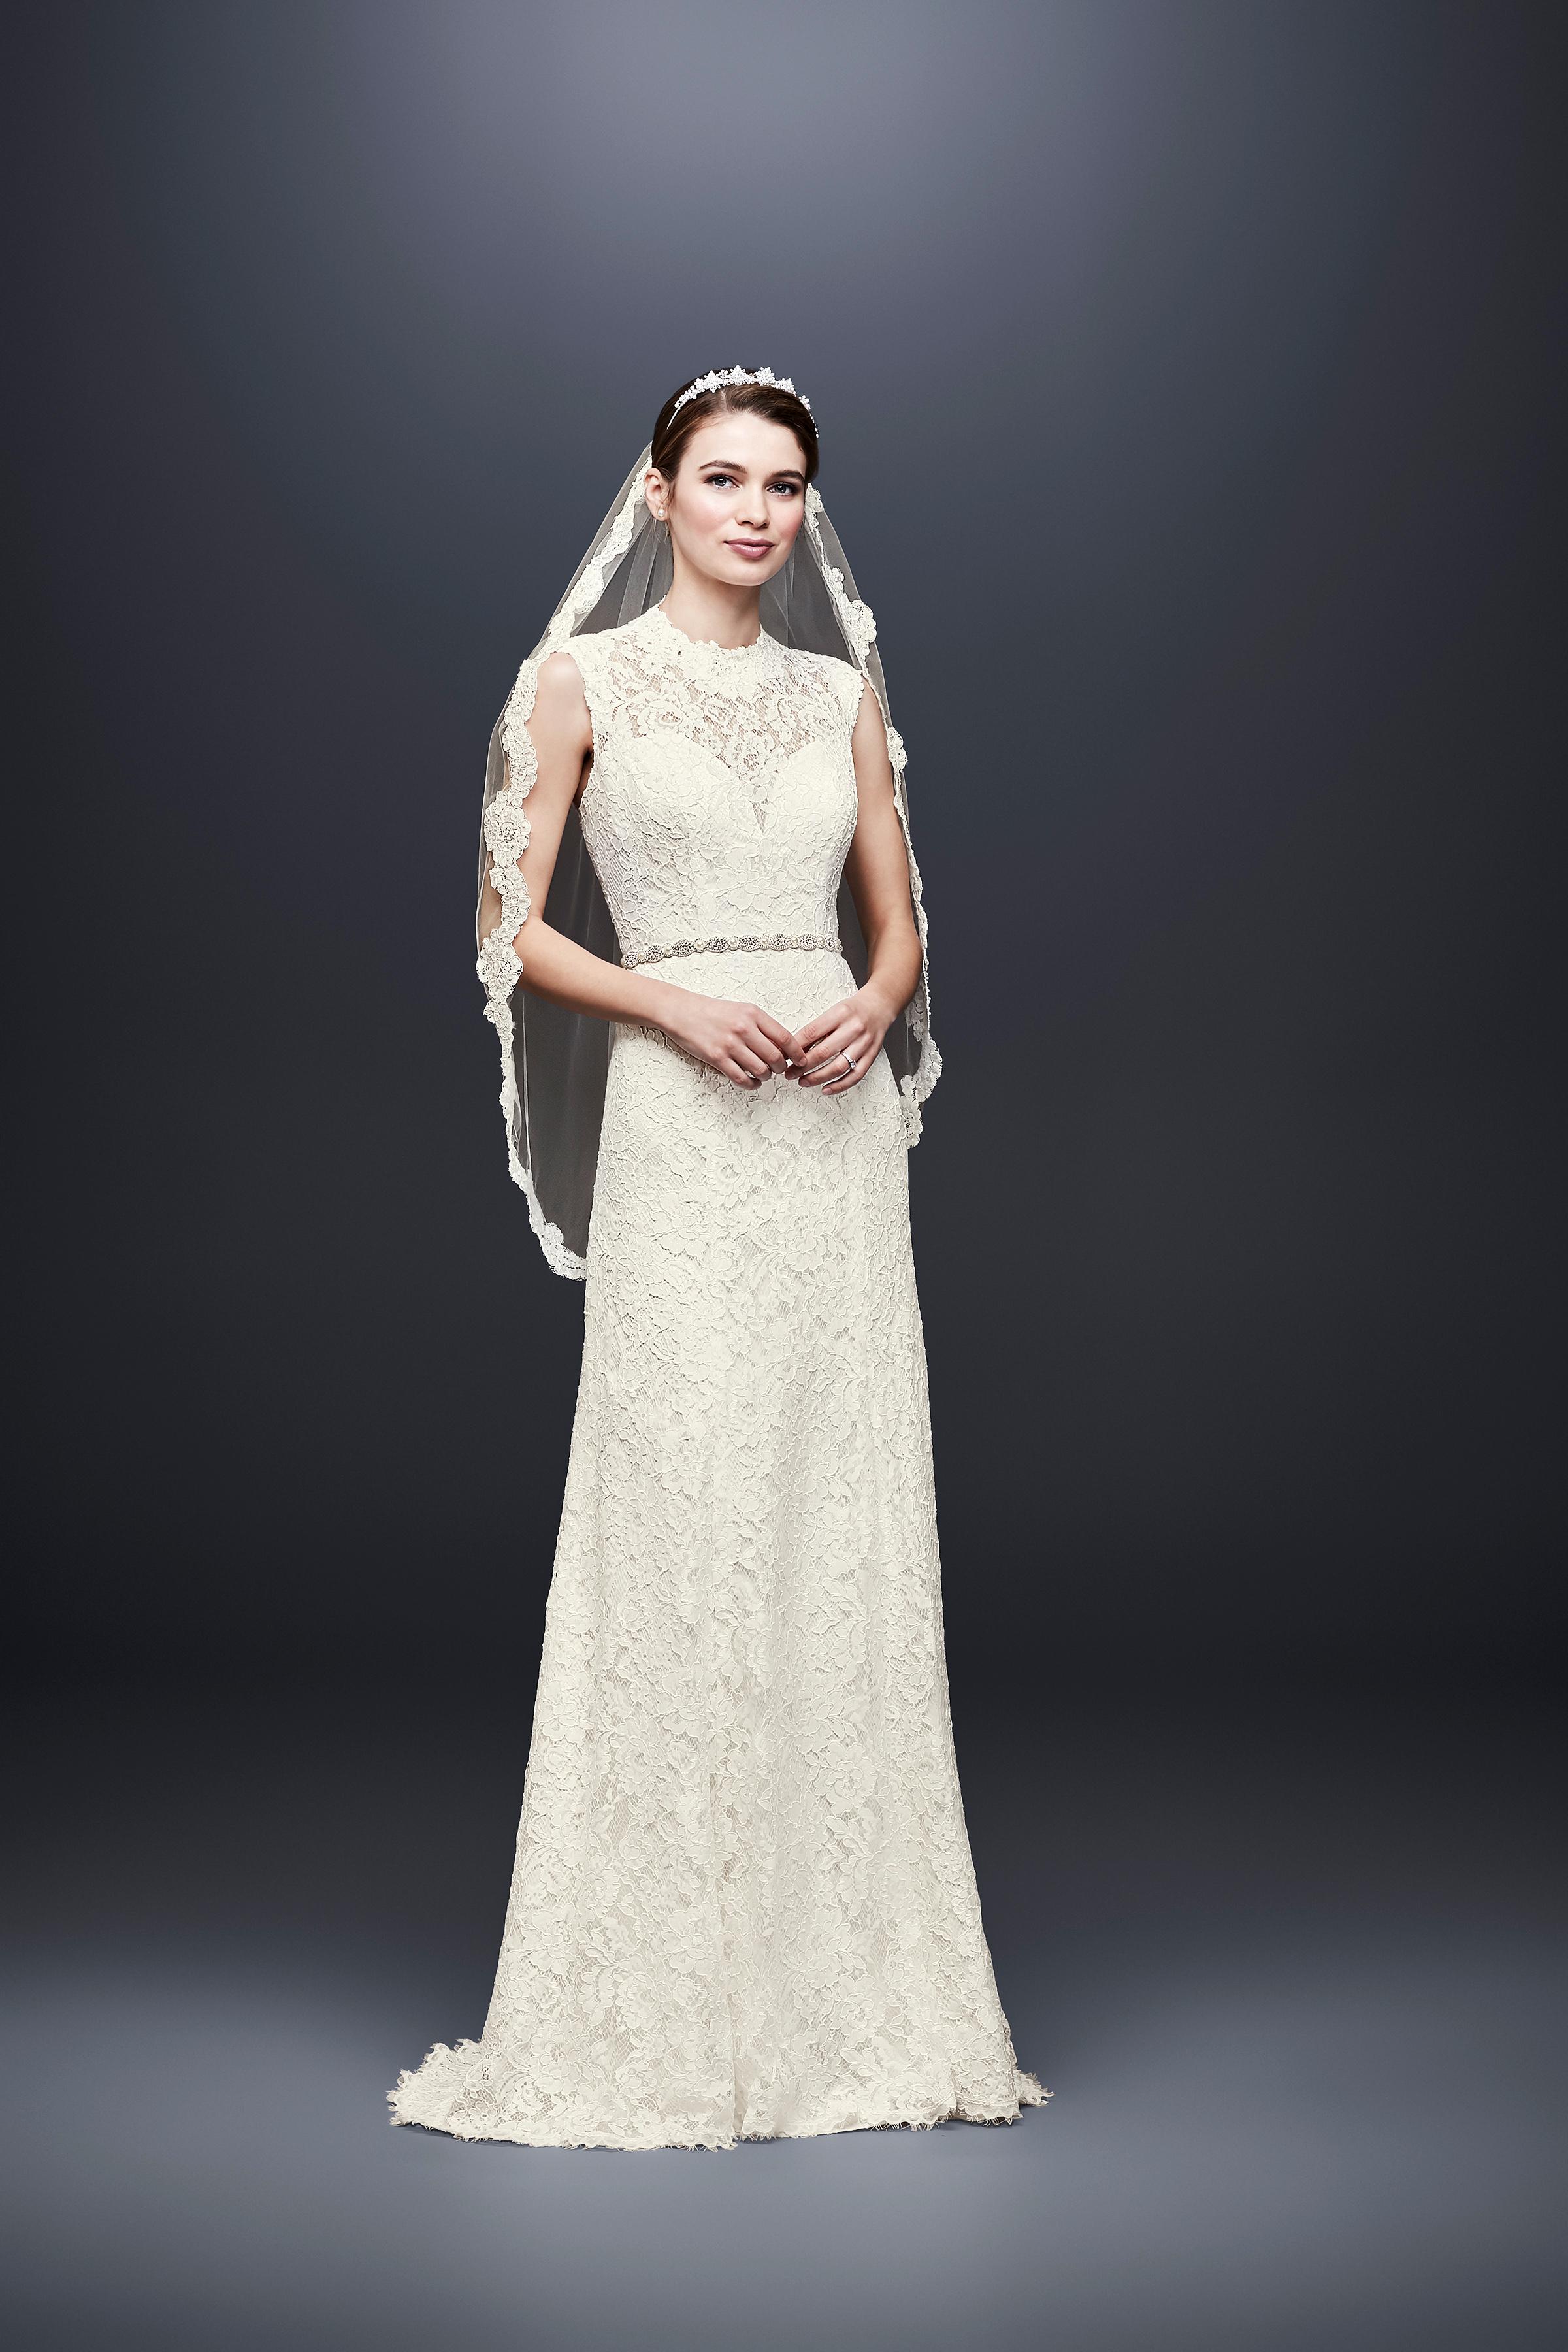 david bridal wedding dress spring 2019 sleeveless high neck lace